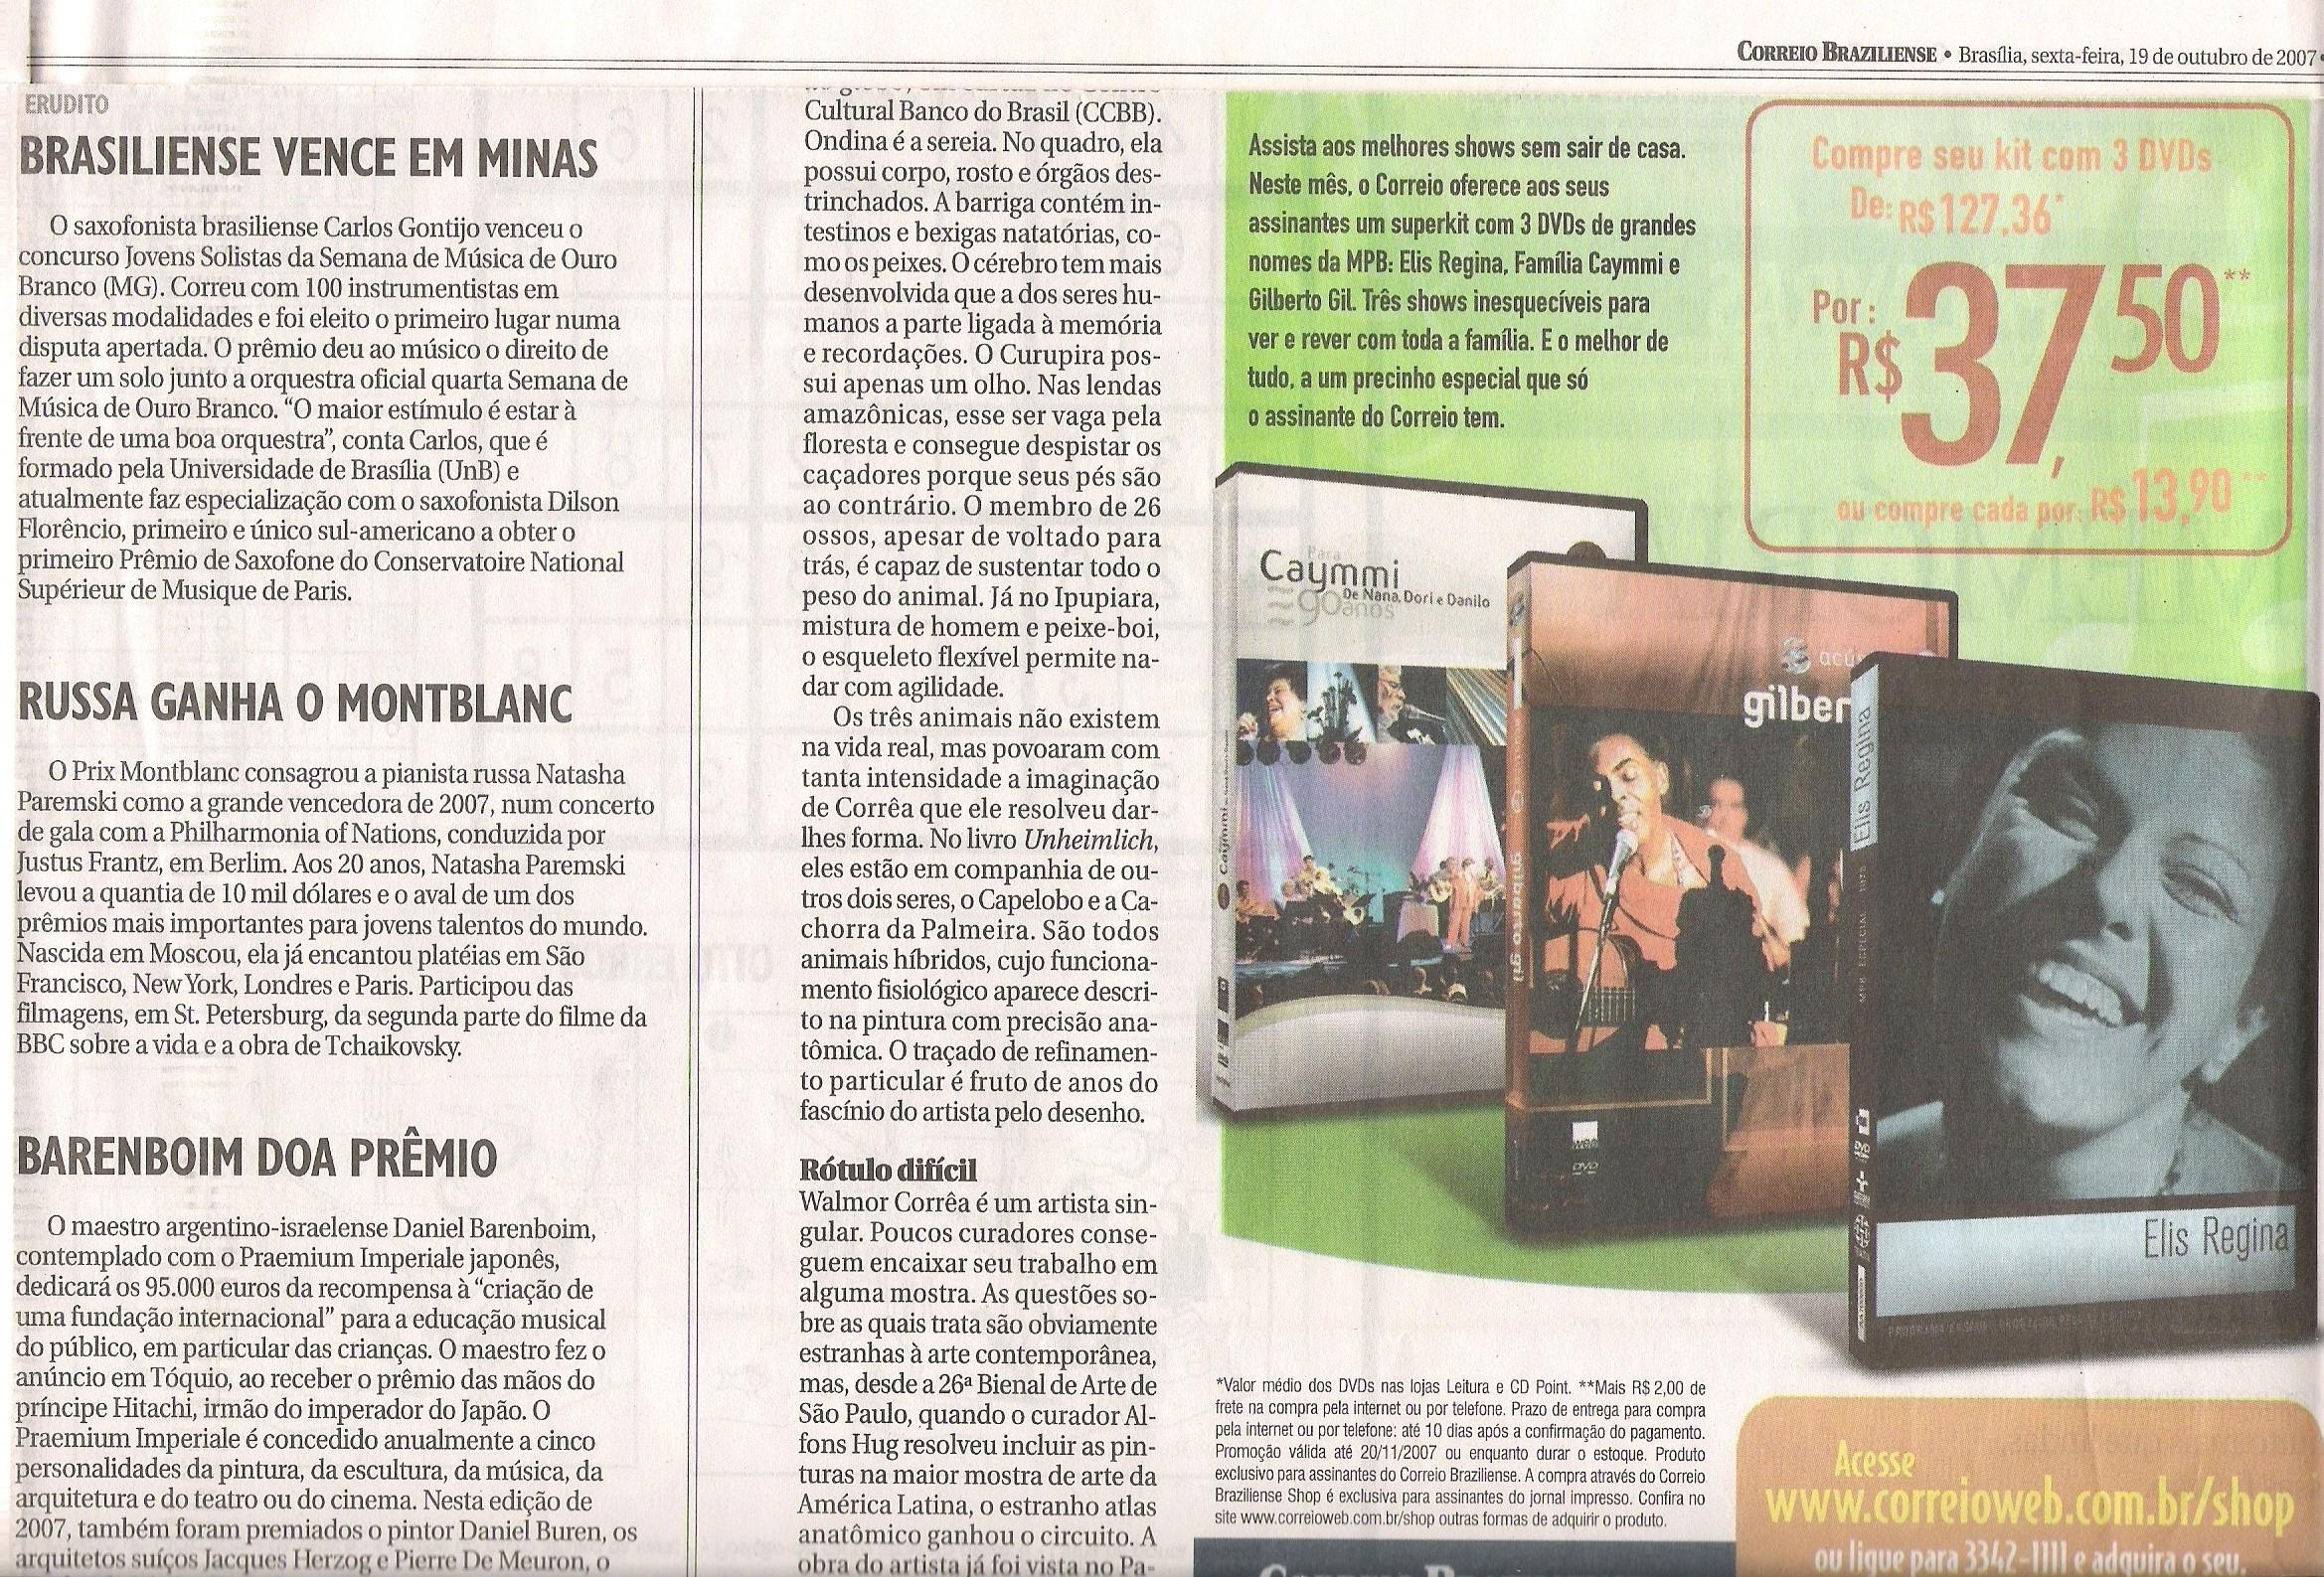 Jornal Correio Braziliense out/2007